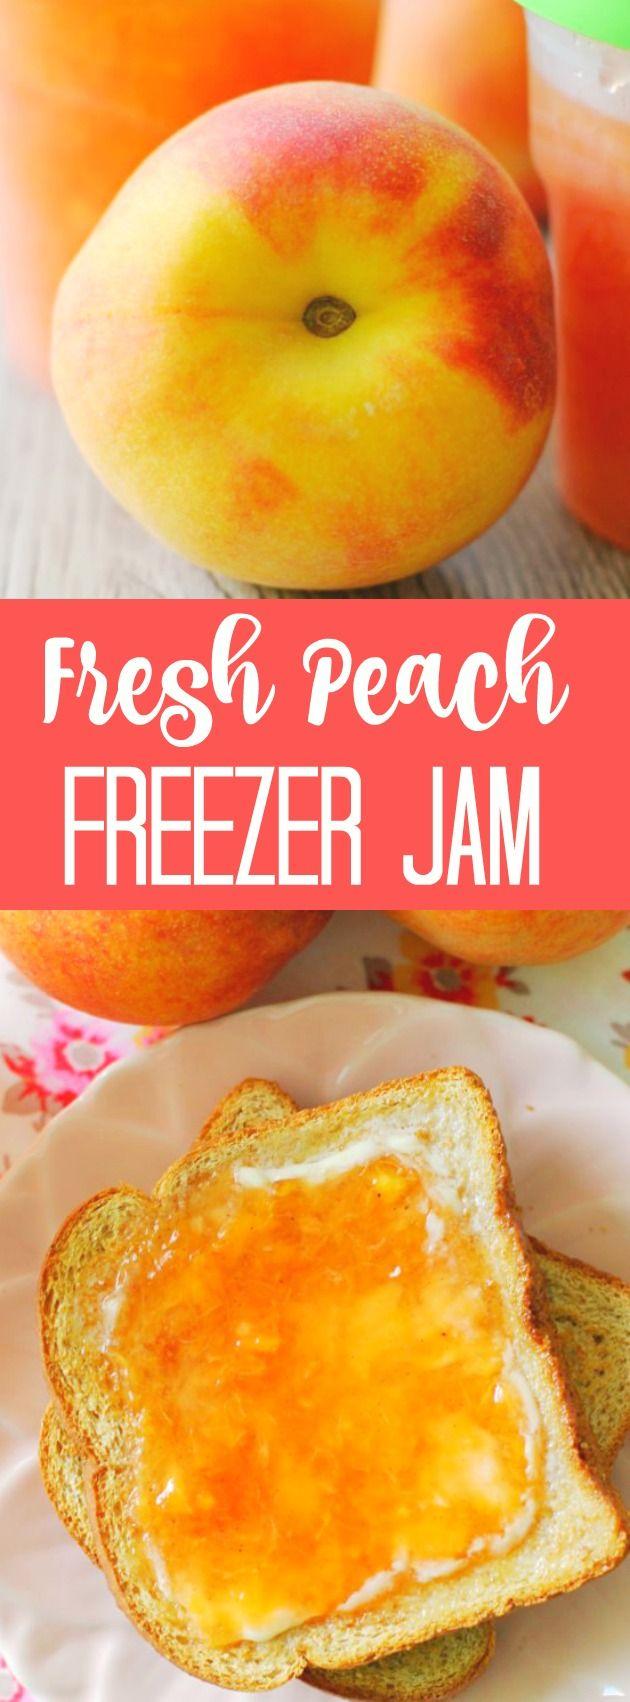 Fresh Peach Freezer Jam